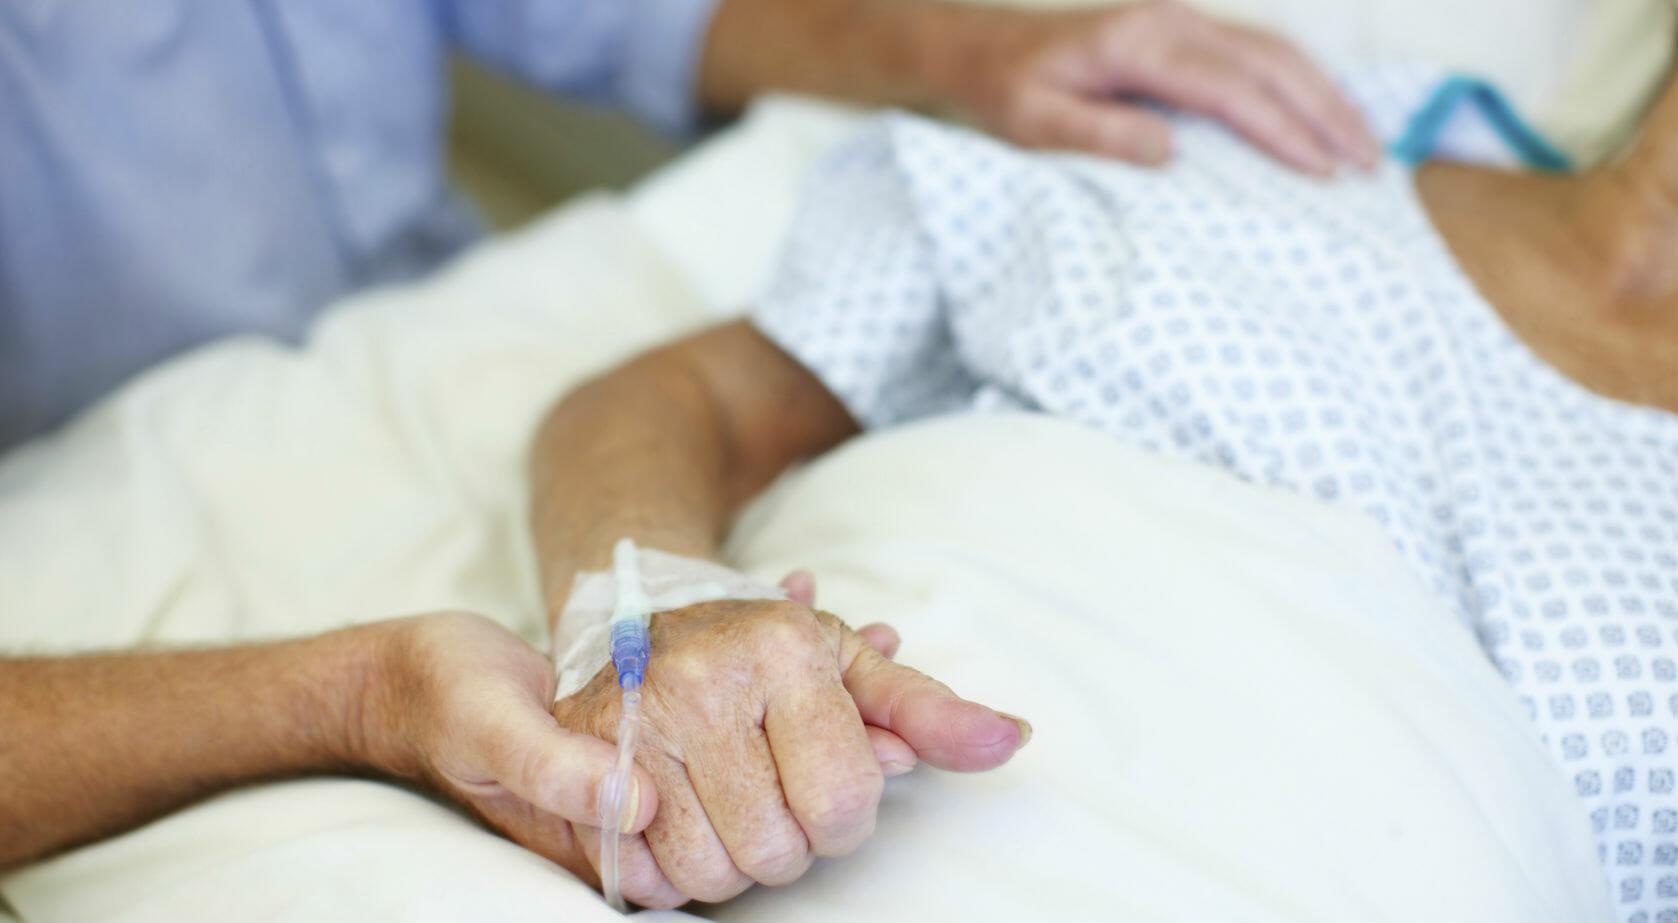 malattia dolore sofferenza ospedale